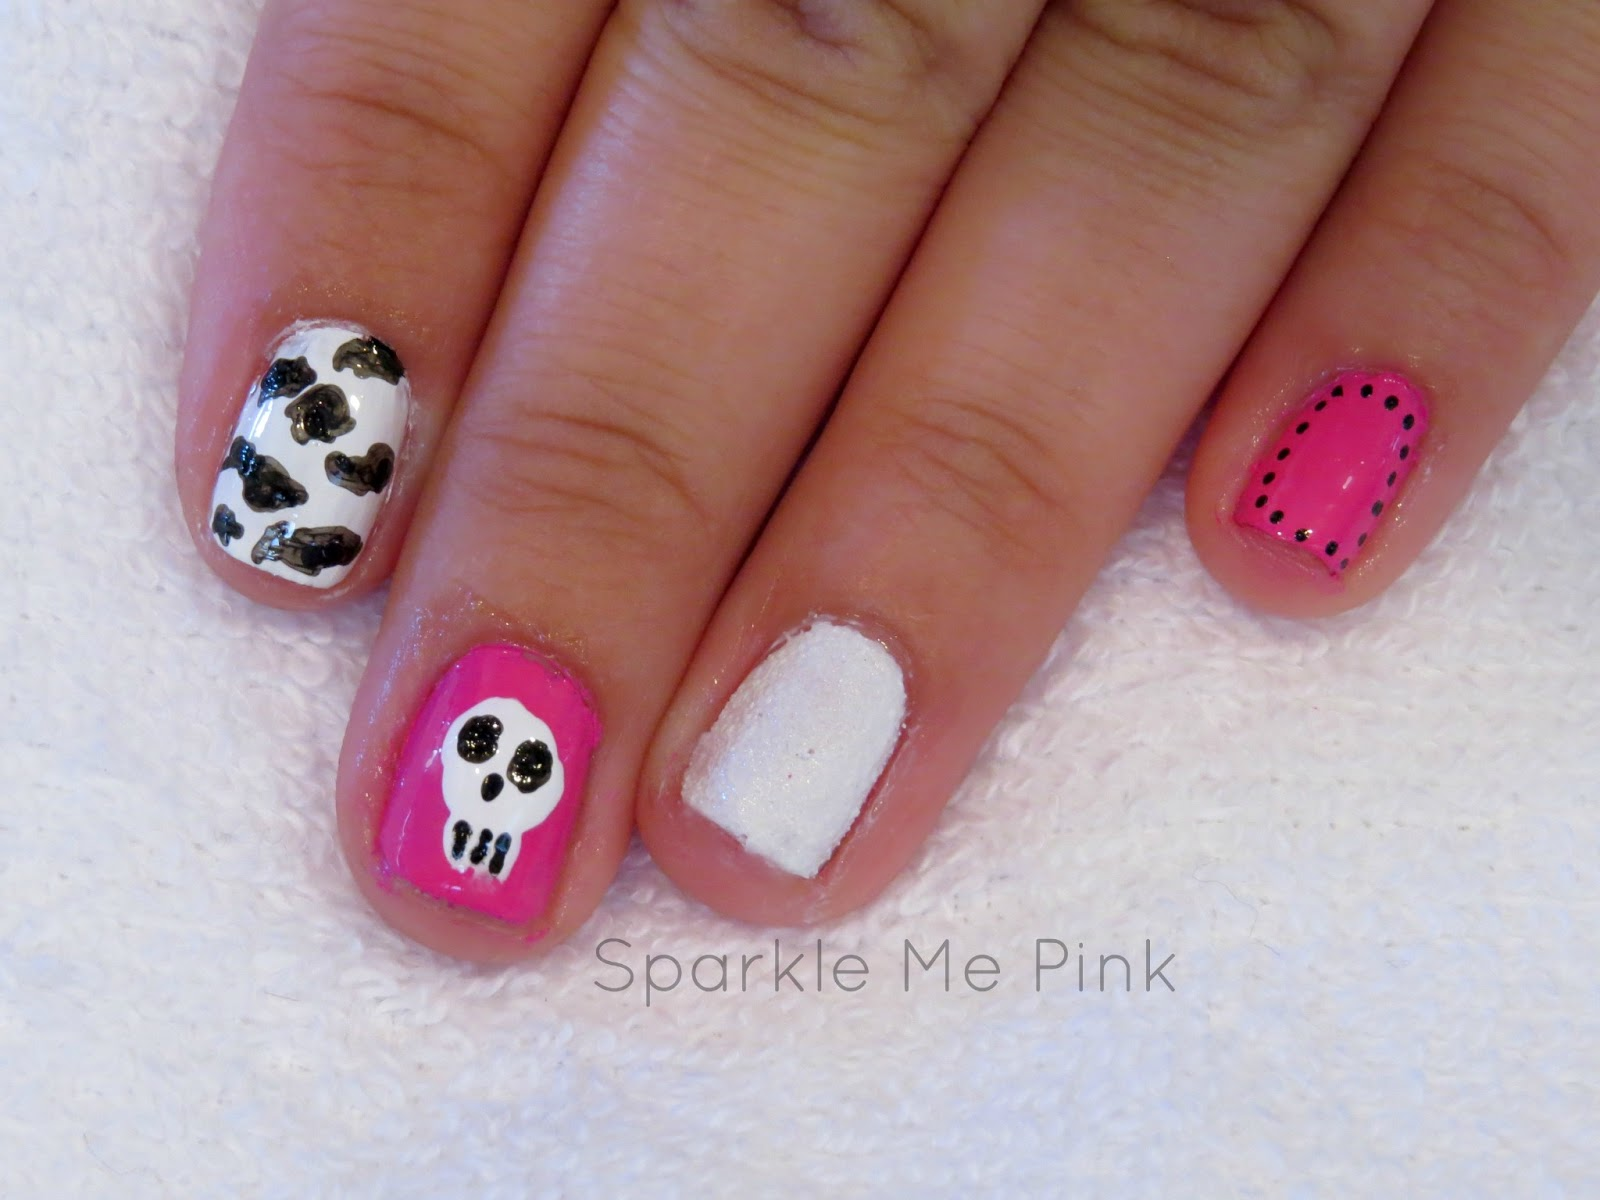 Sparkle Me Pink Street Style All Sally Hansen Punk Nail Art Tutorial